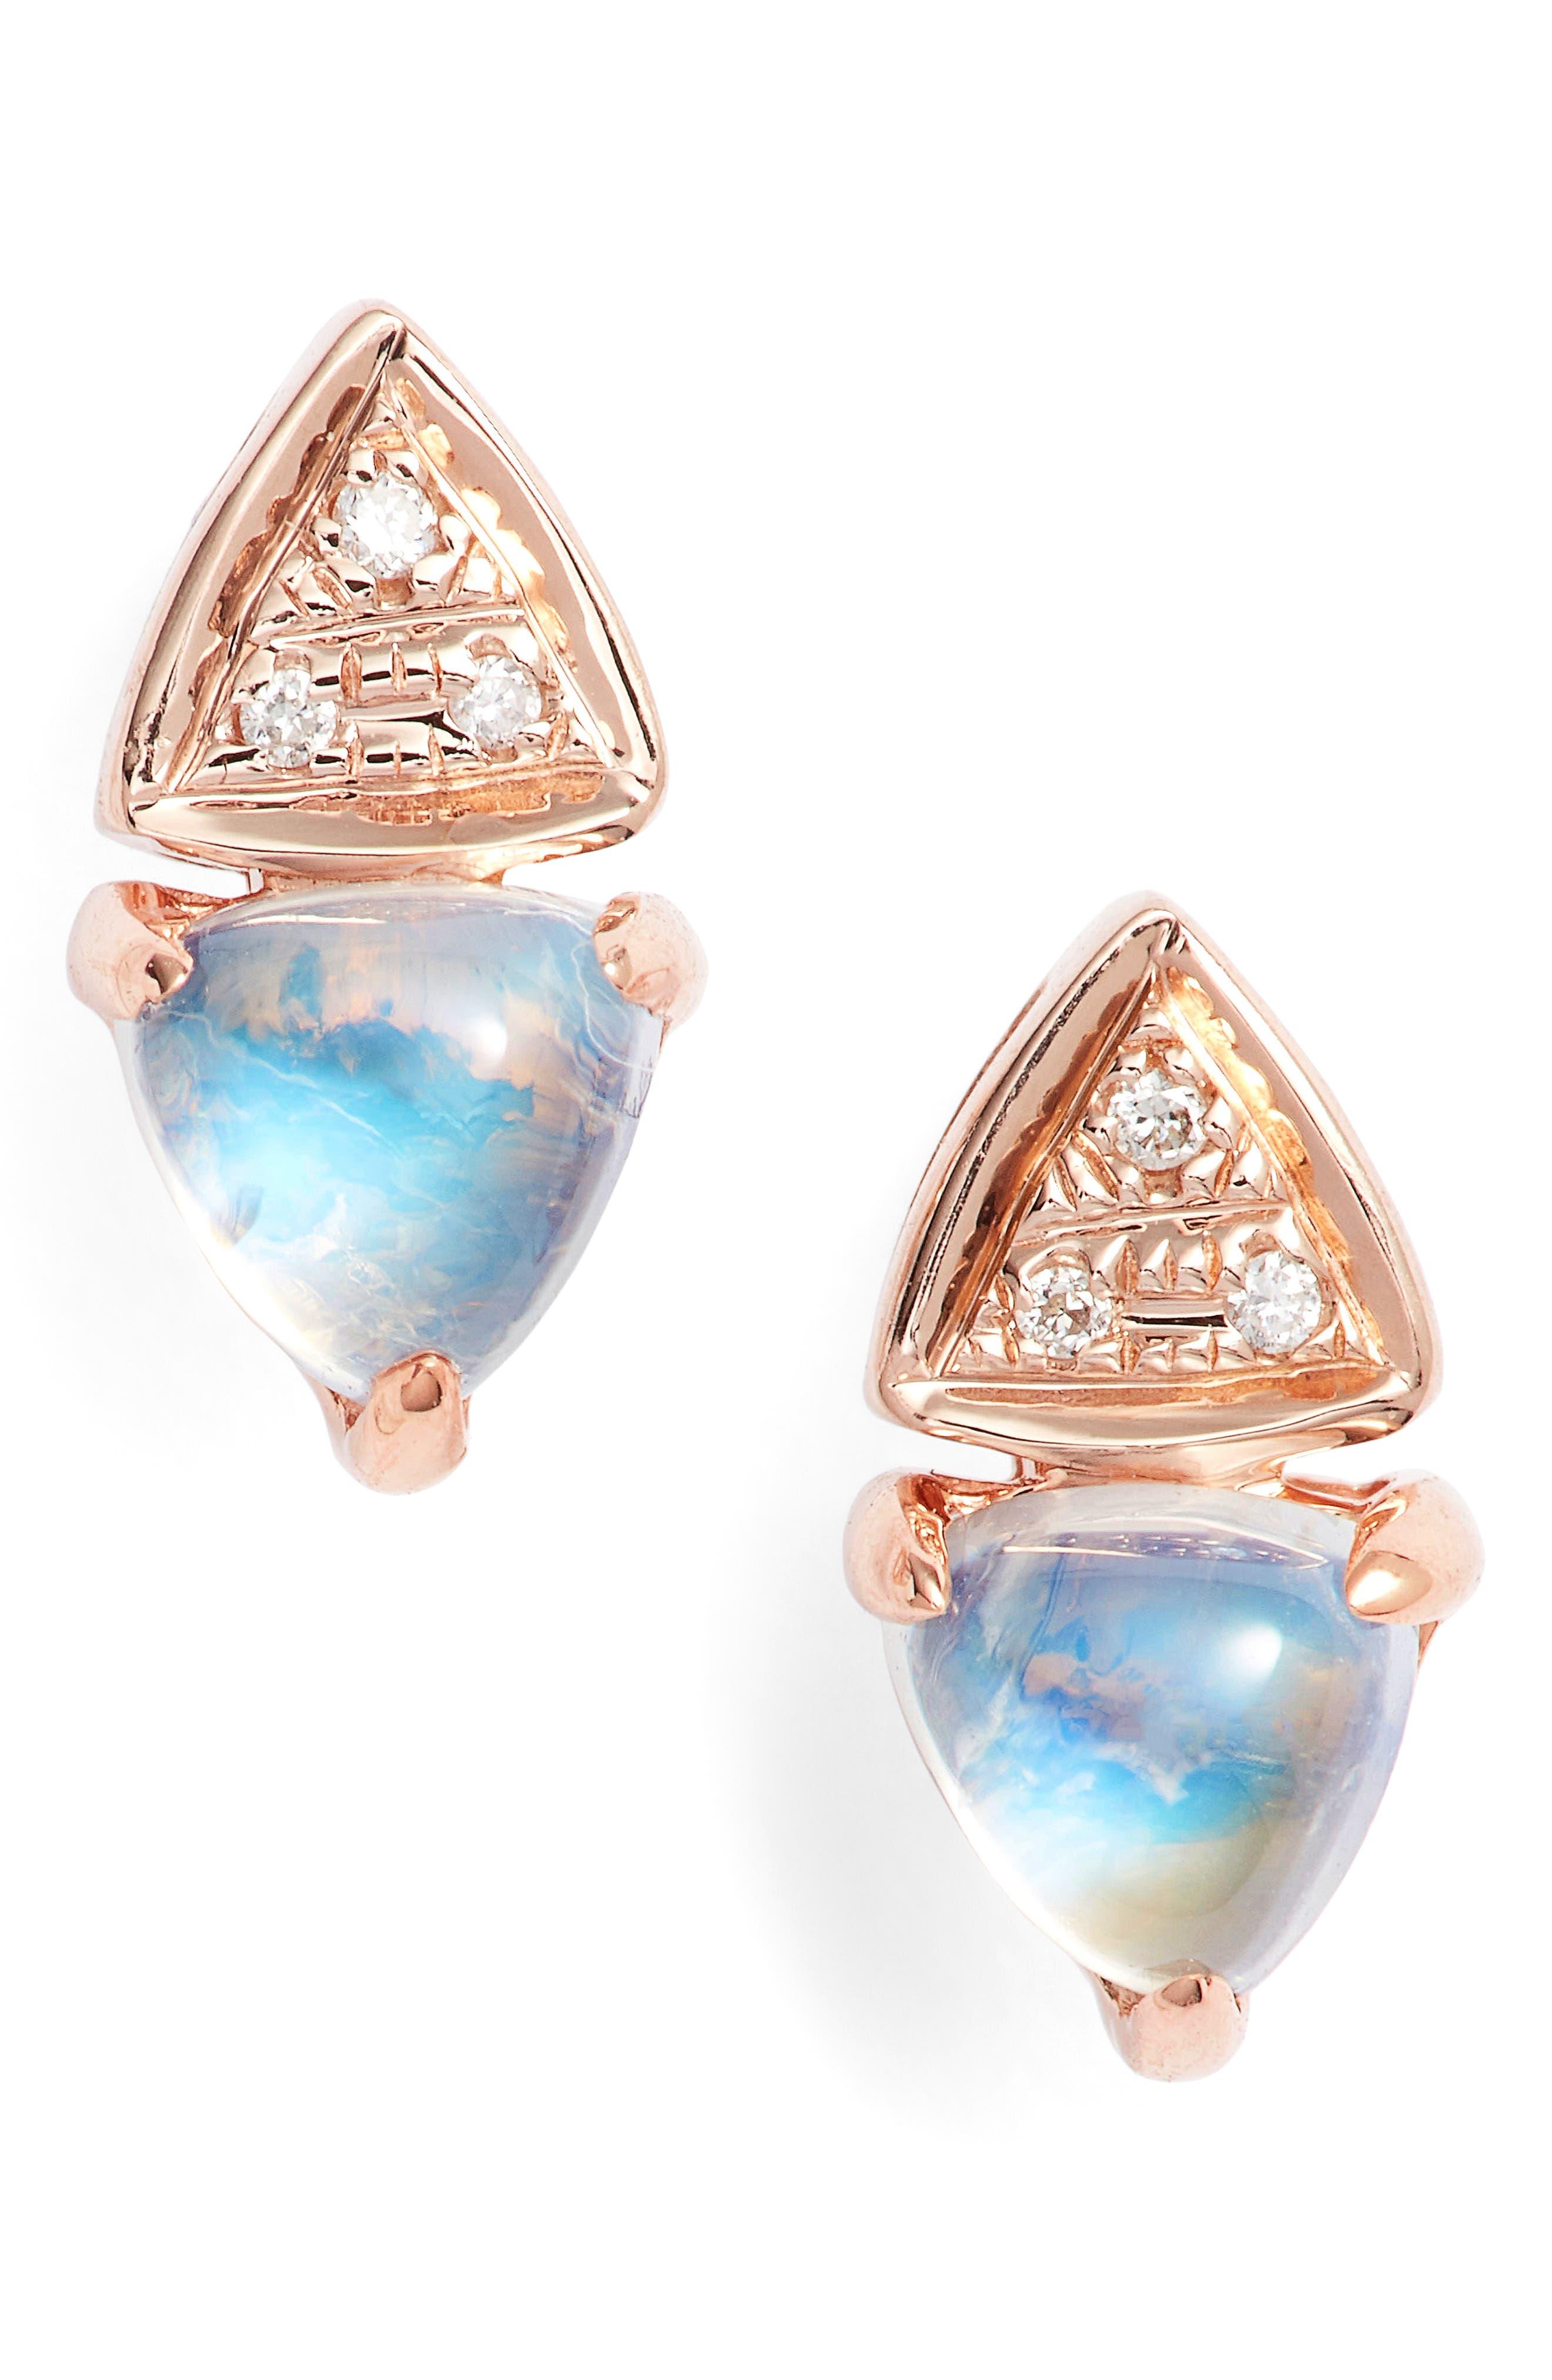 Diamond & Stone Stud Earrings,                             Main thumbnail 1, color,                             Rose Gold